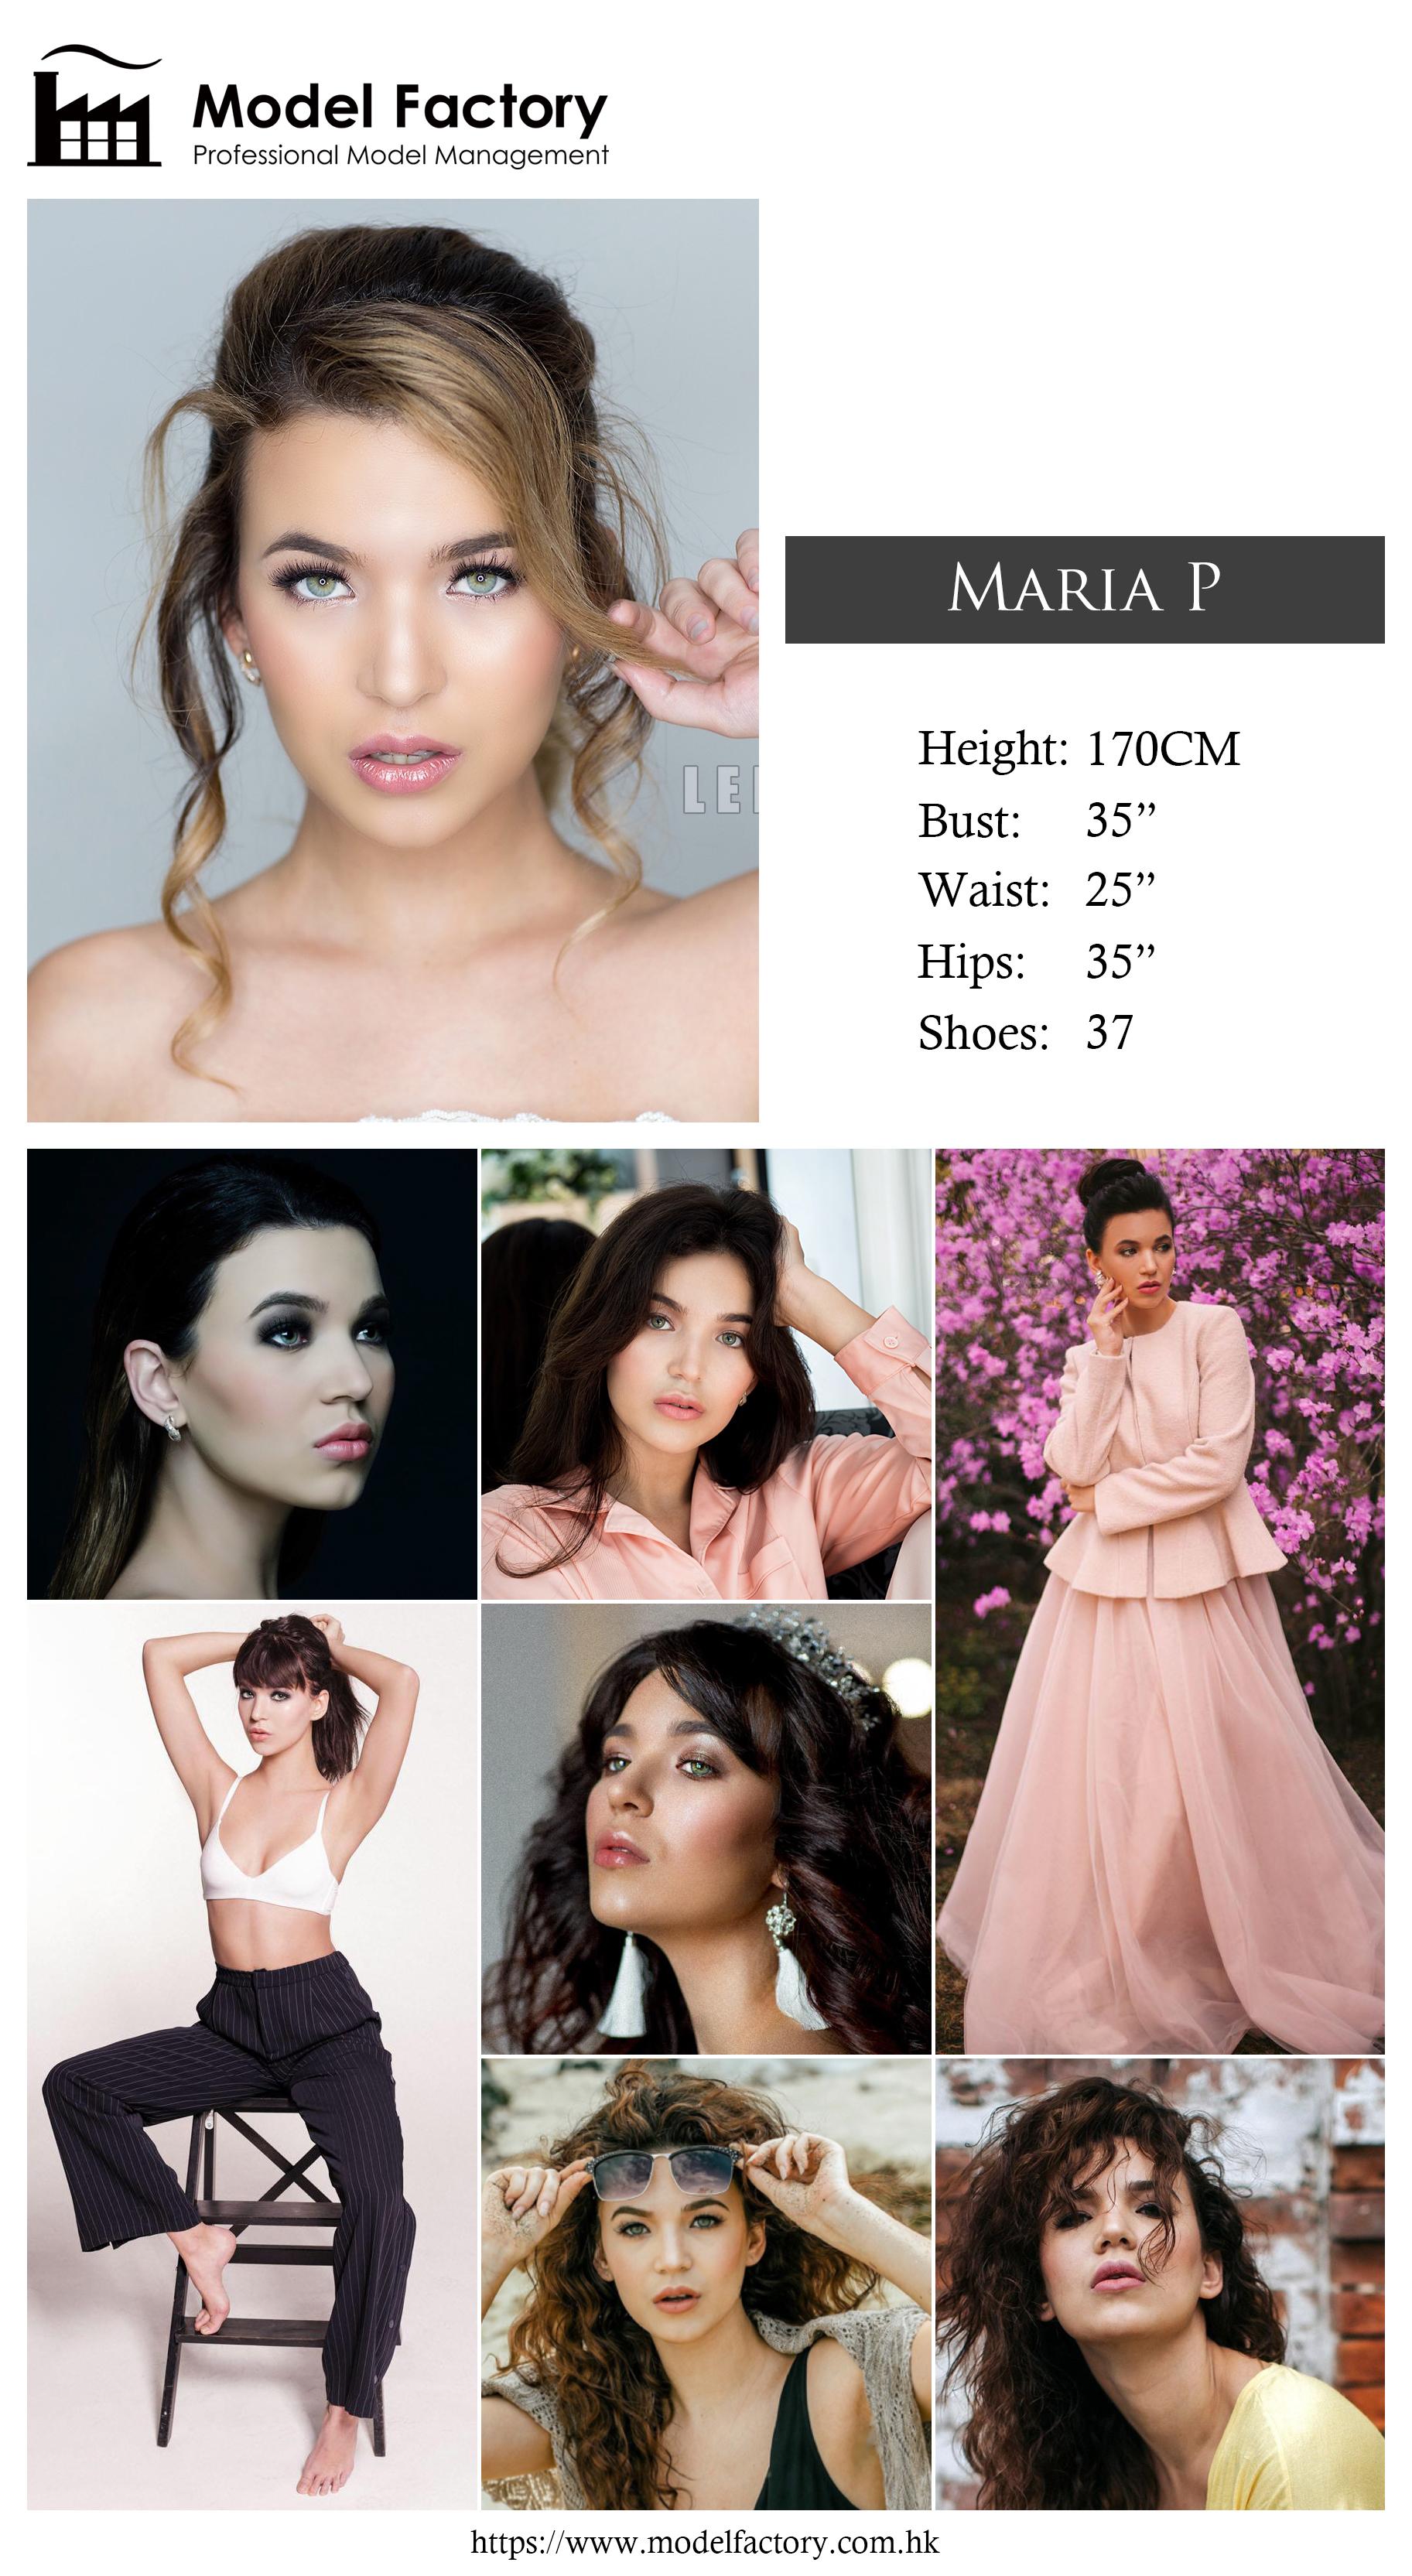 Model Factory Caucasian Female Model MariaP